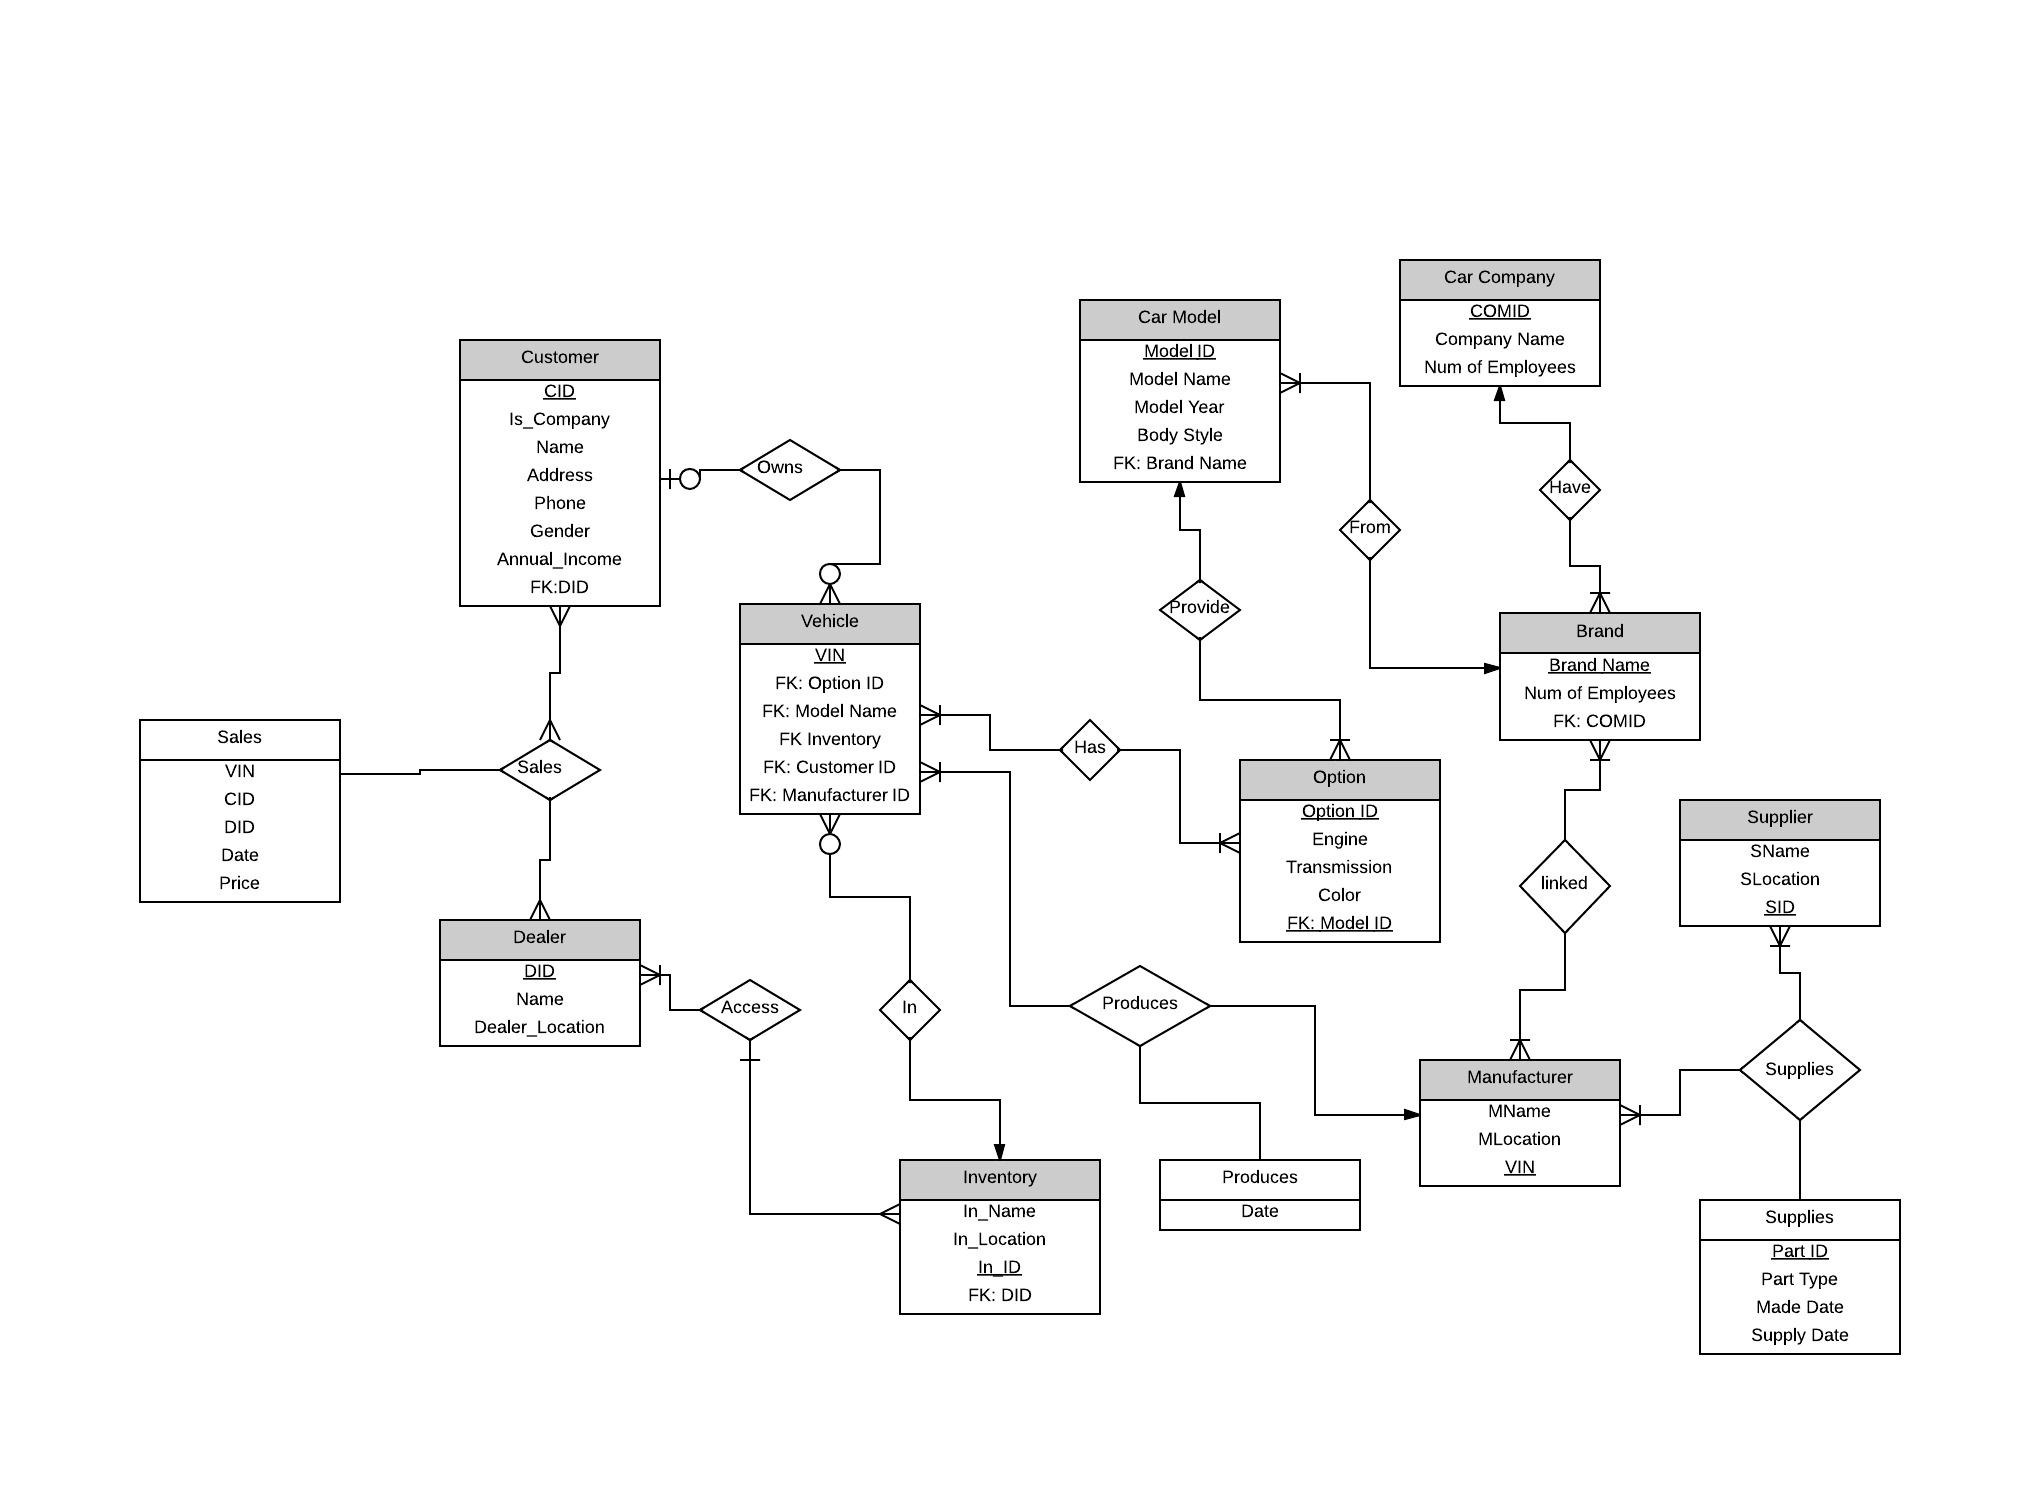 Er Diagram Car - 7.fearless-Wonder.de • regarding Er Diagram Examples For Car Rental System